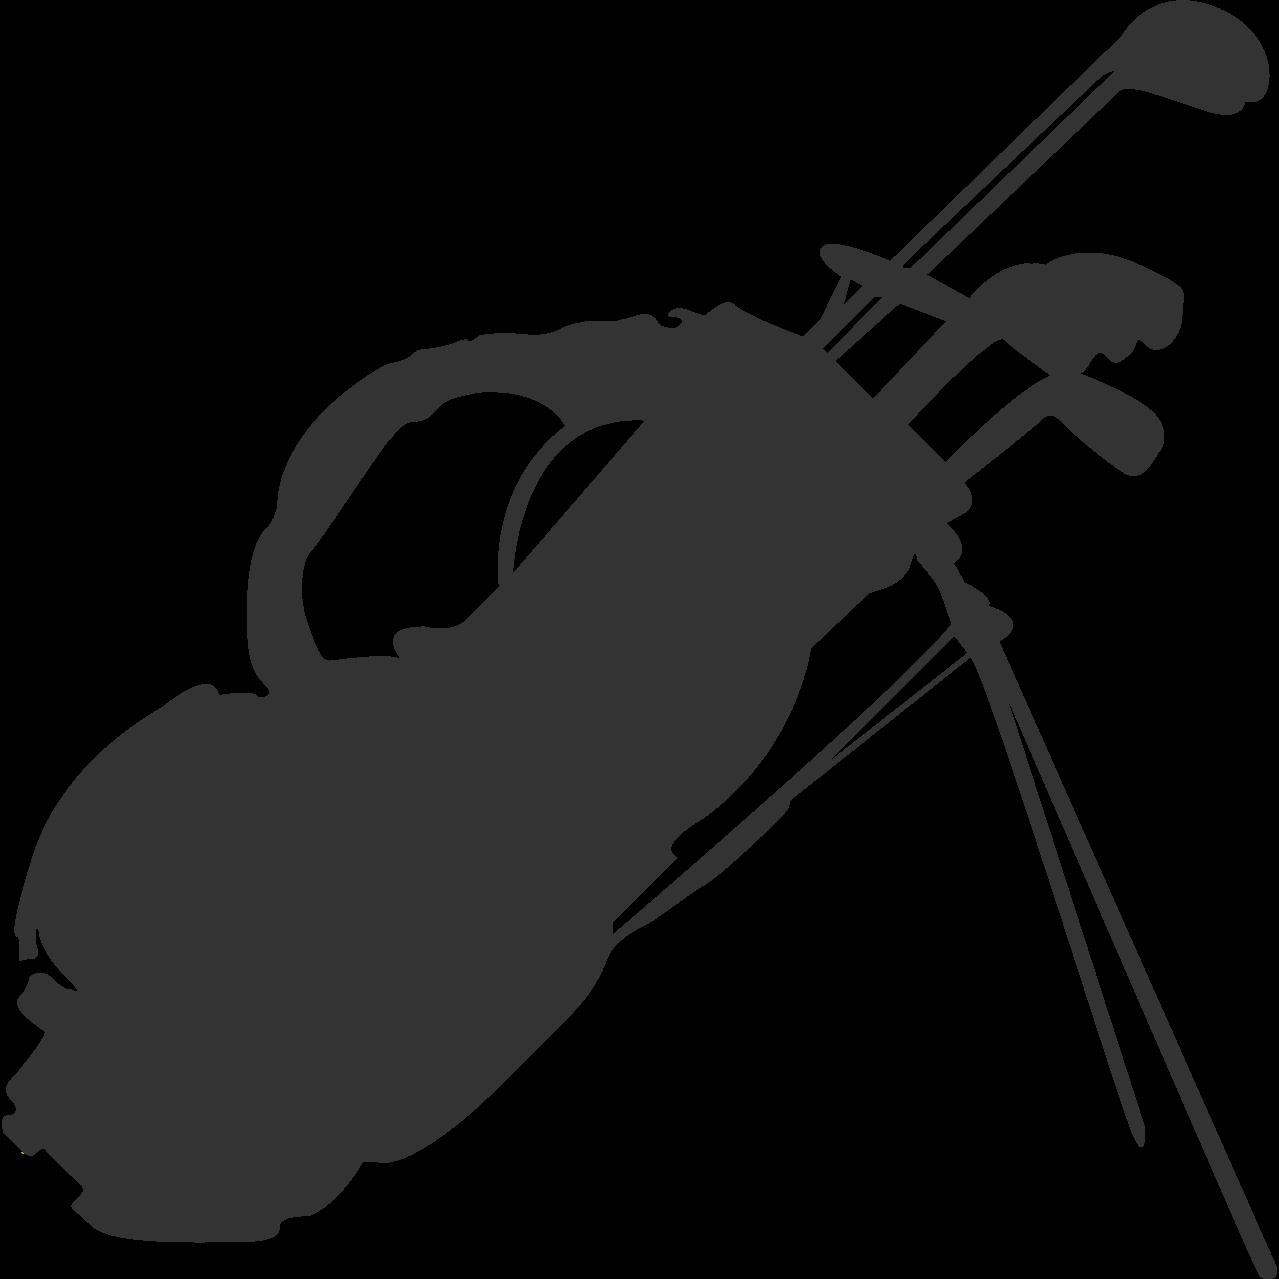 1 golf club silhouette clipart banner free library Golf Clubs Golfbag Sports - Tahiti Hut Silhouette png download ... banner free library